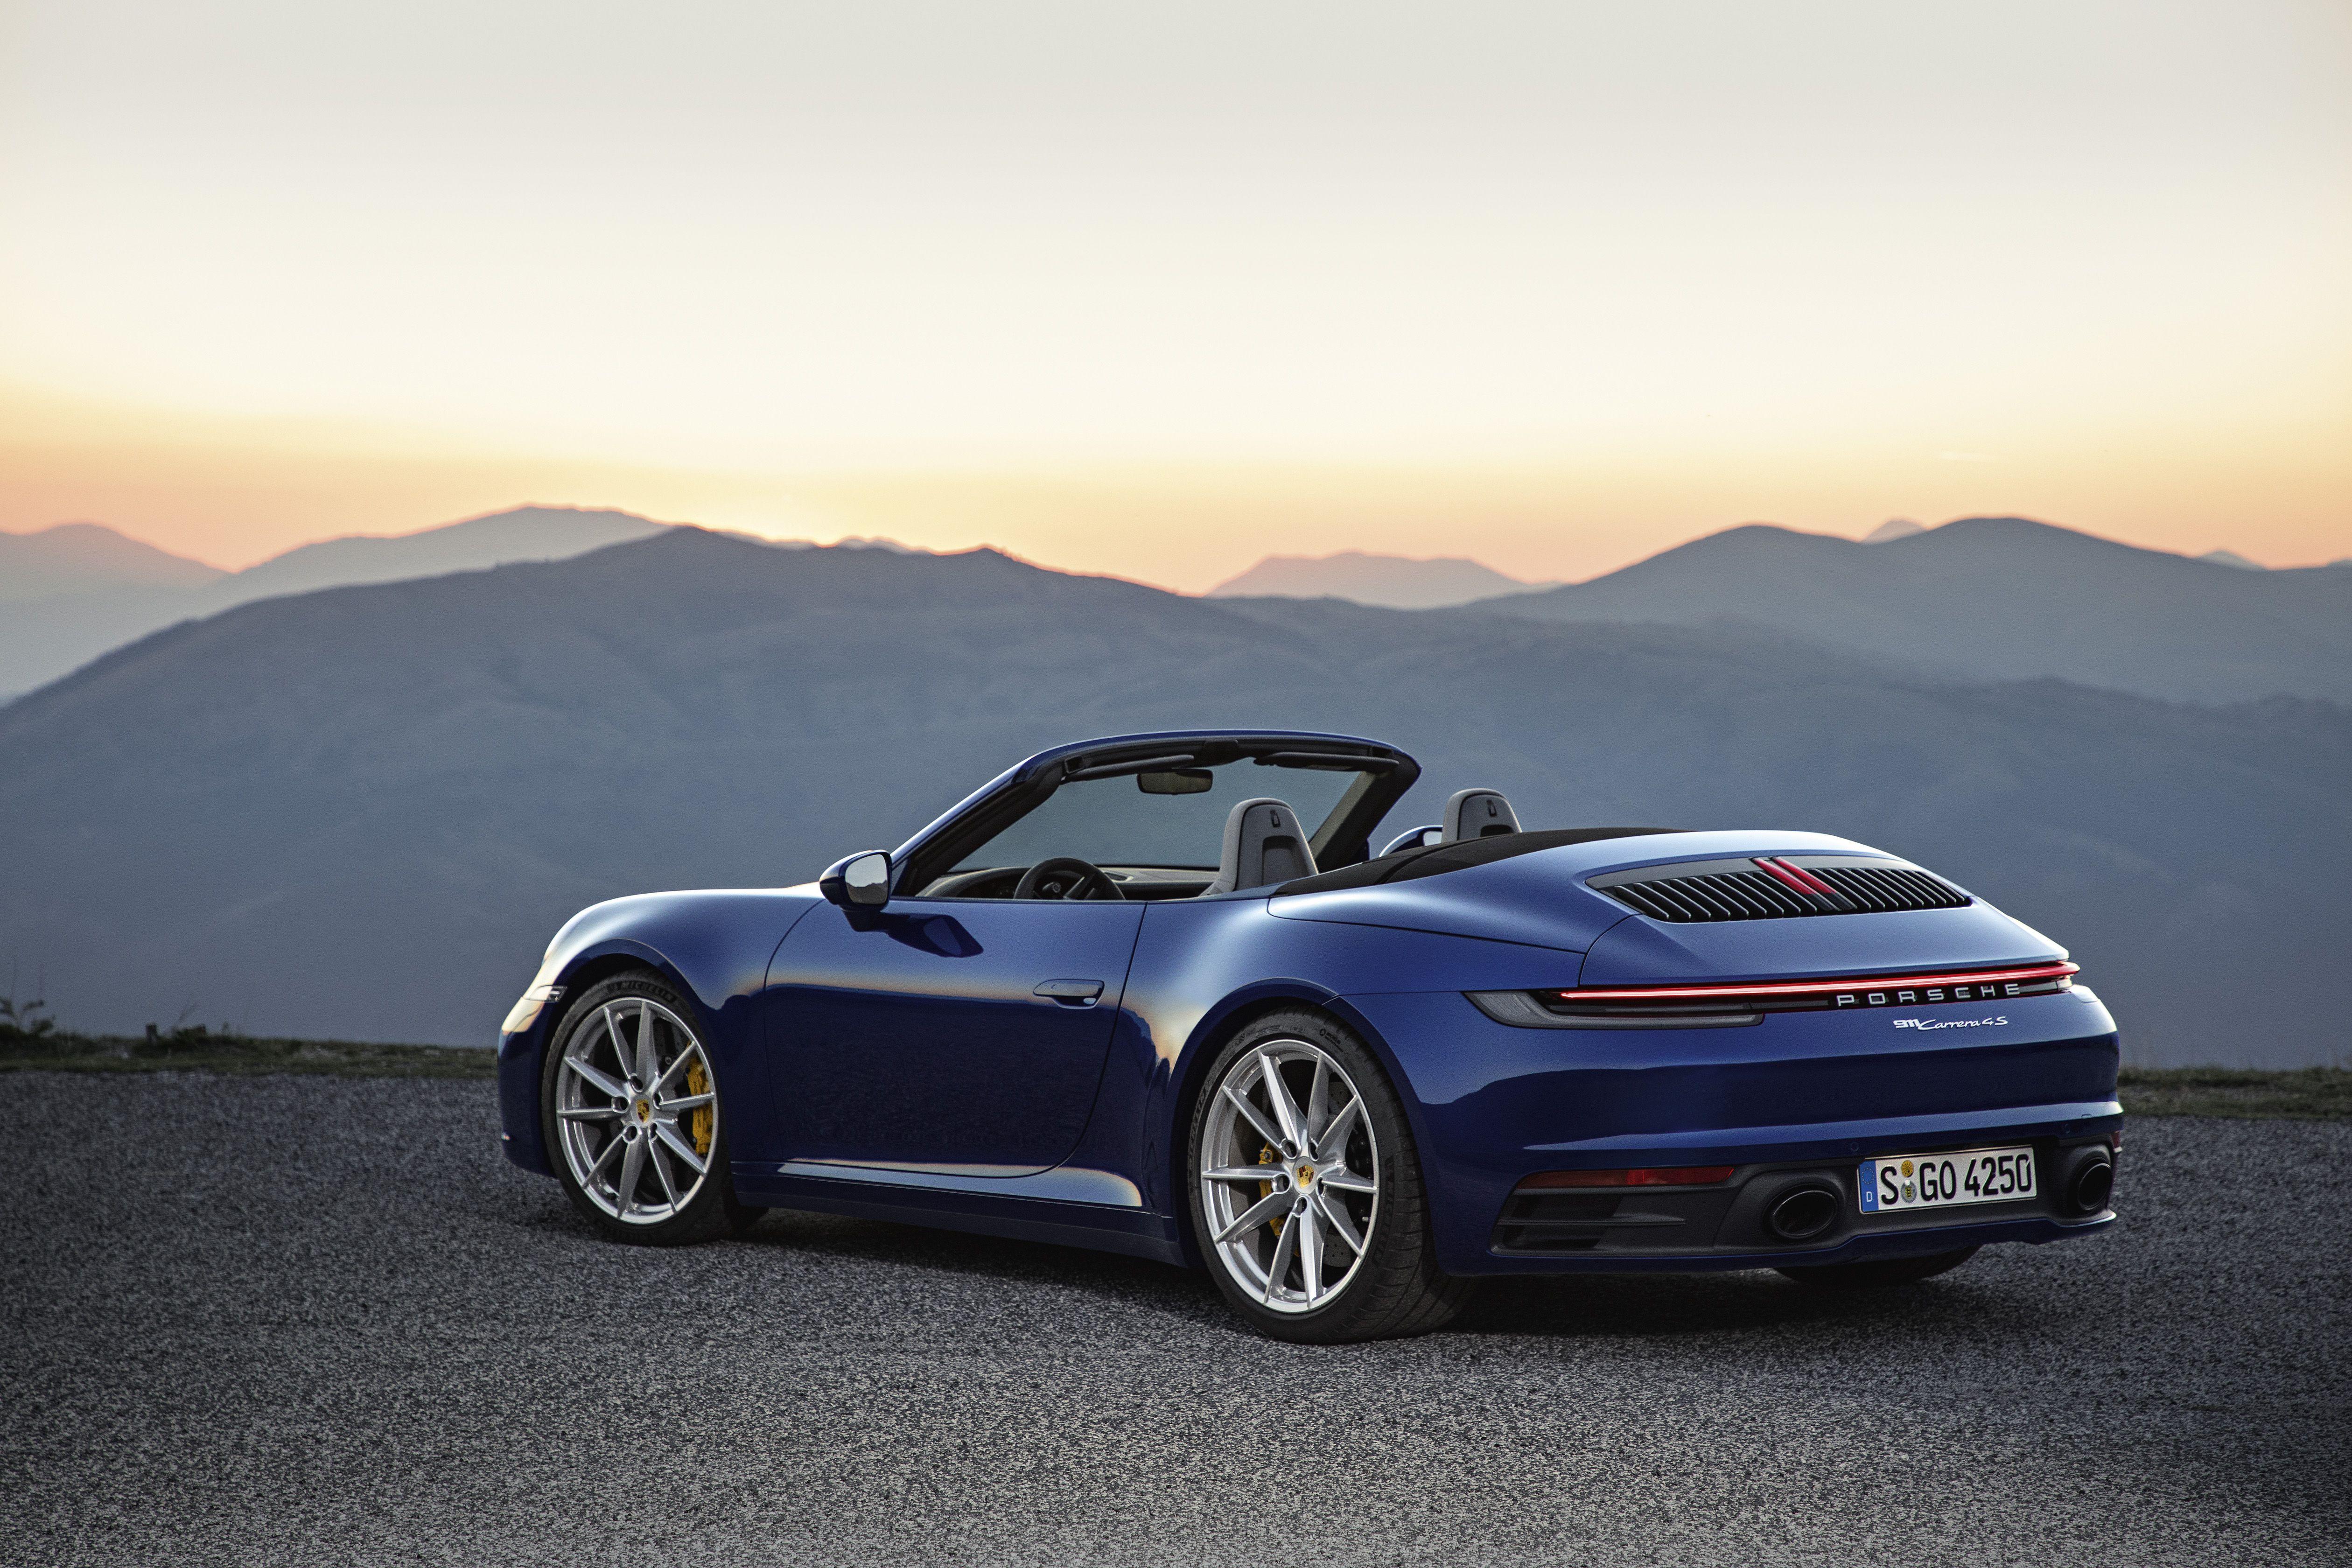 Pin By Elite Traveler On Autos Alemanes Germans Cars Porsche Convertible Porsche 911 Cabriolet Porsche 911